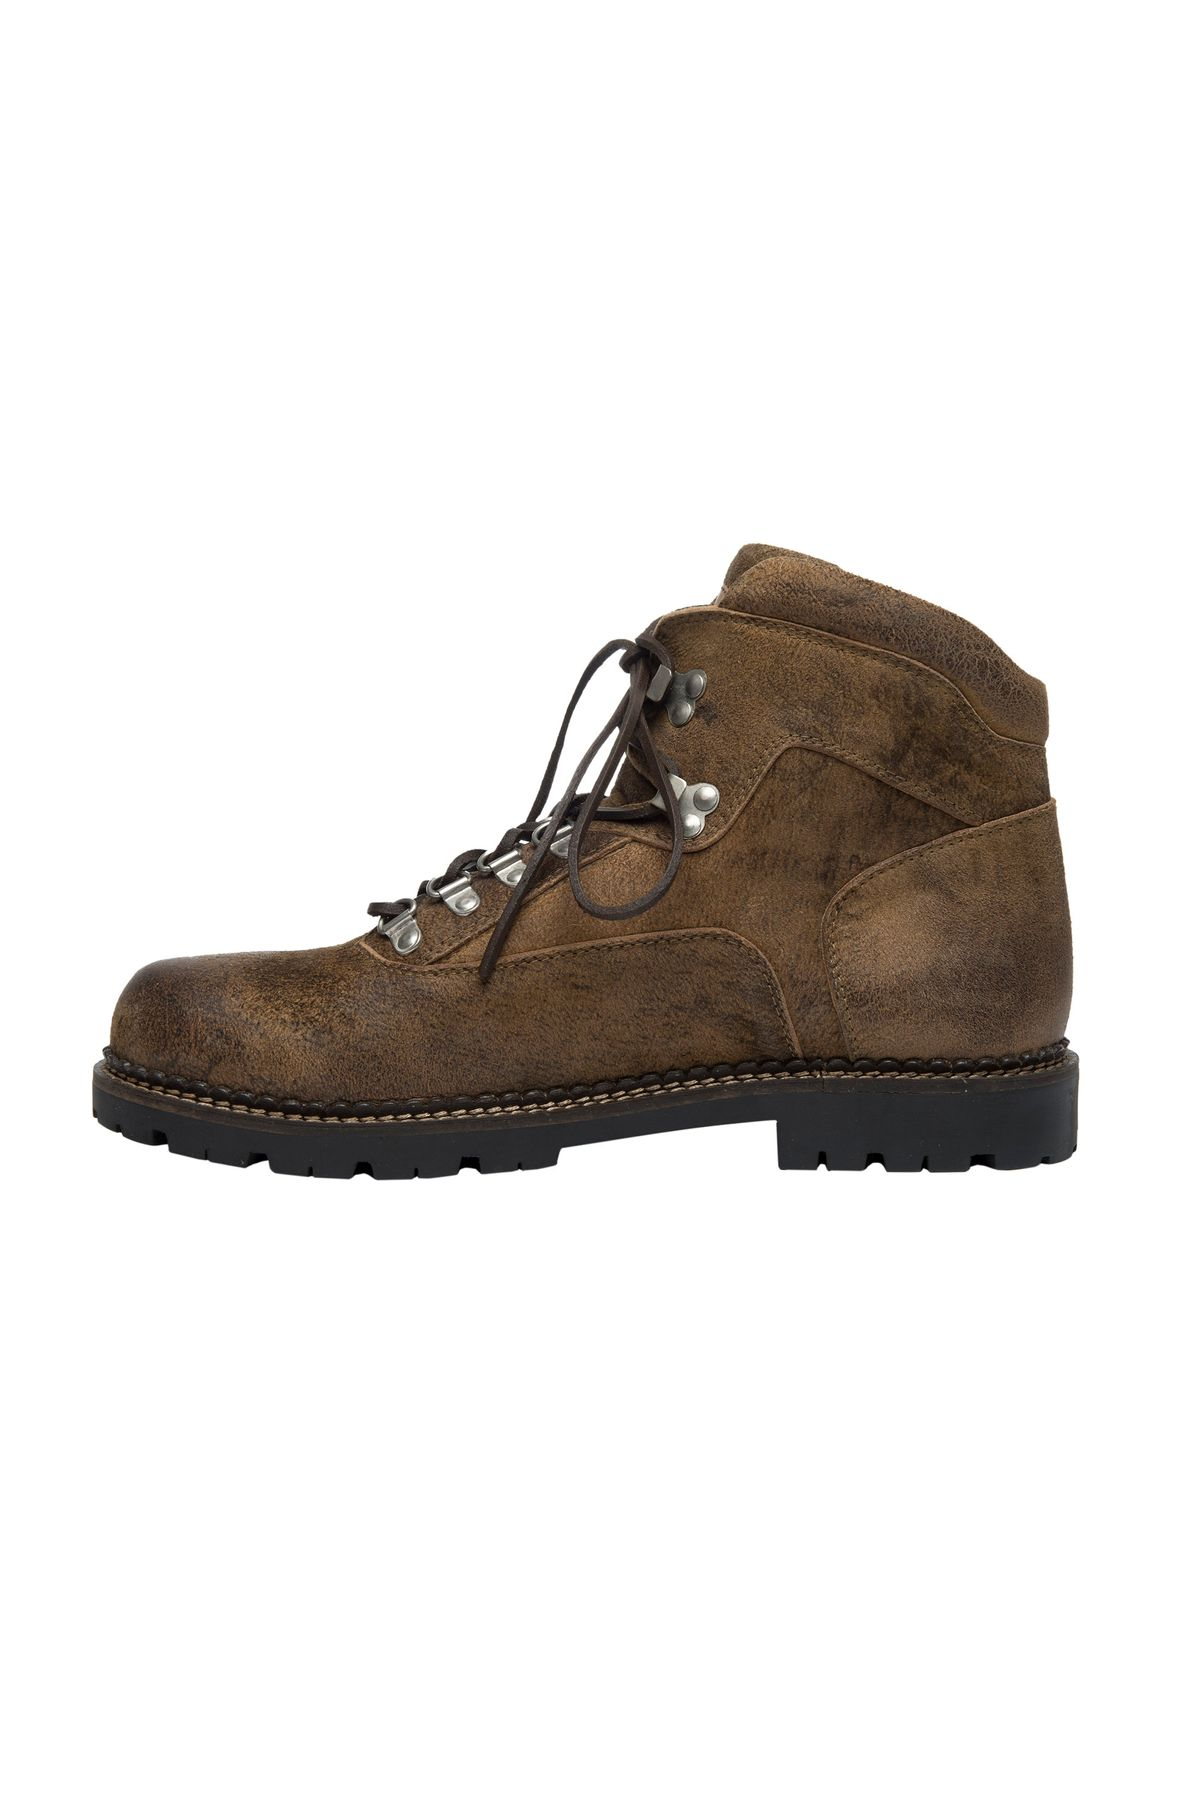 STOCKERPOINT - Herren Trachten Schuhe, 4460 – Bild 16